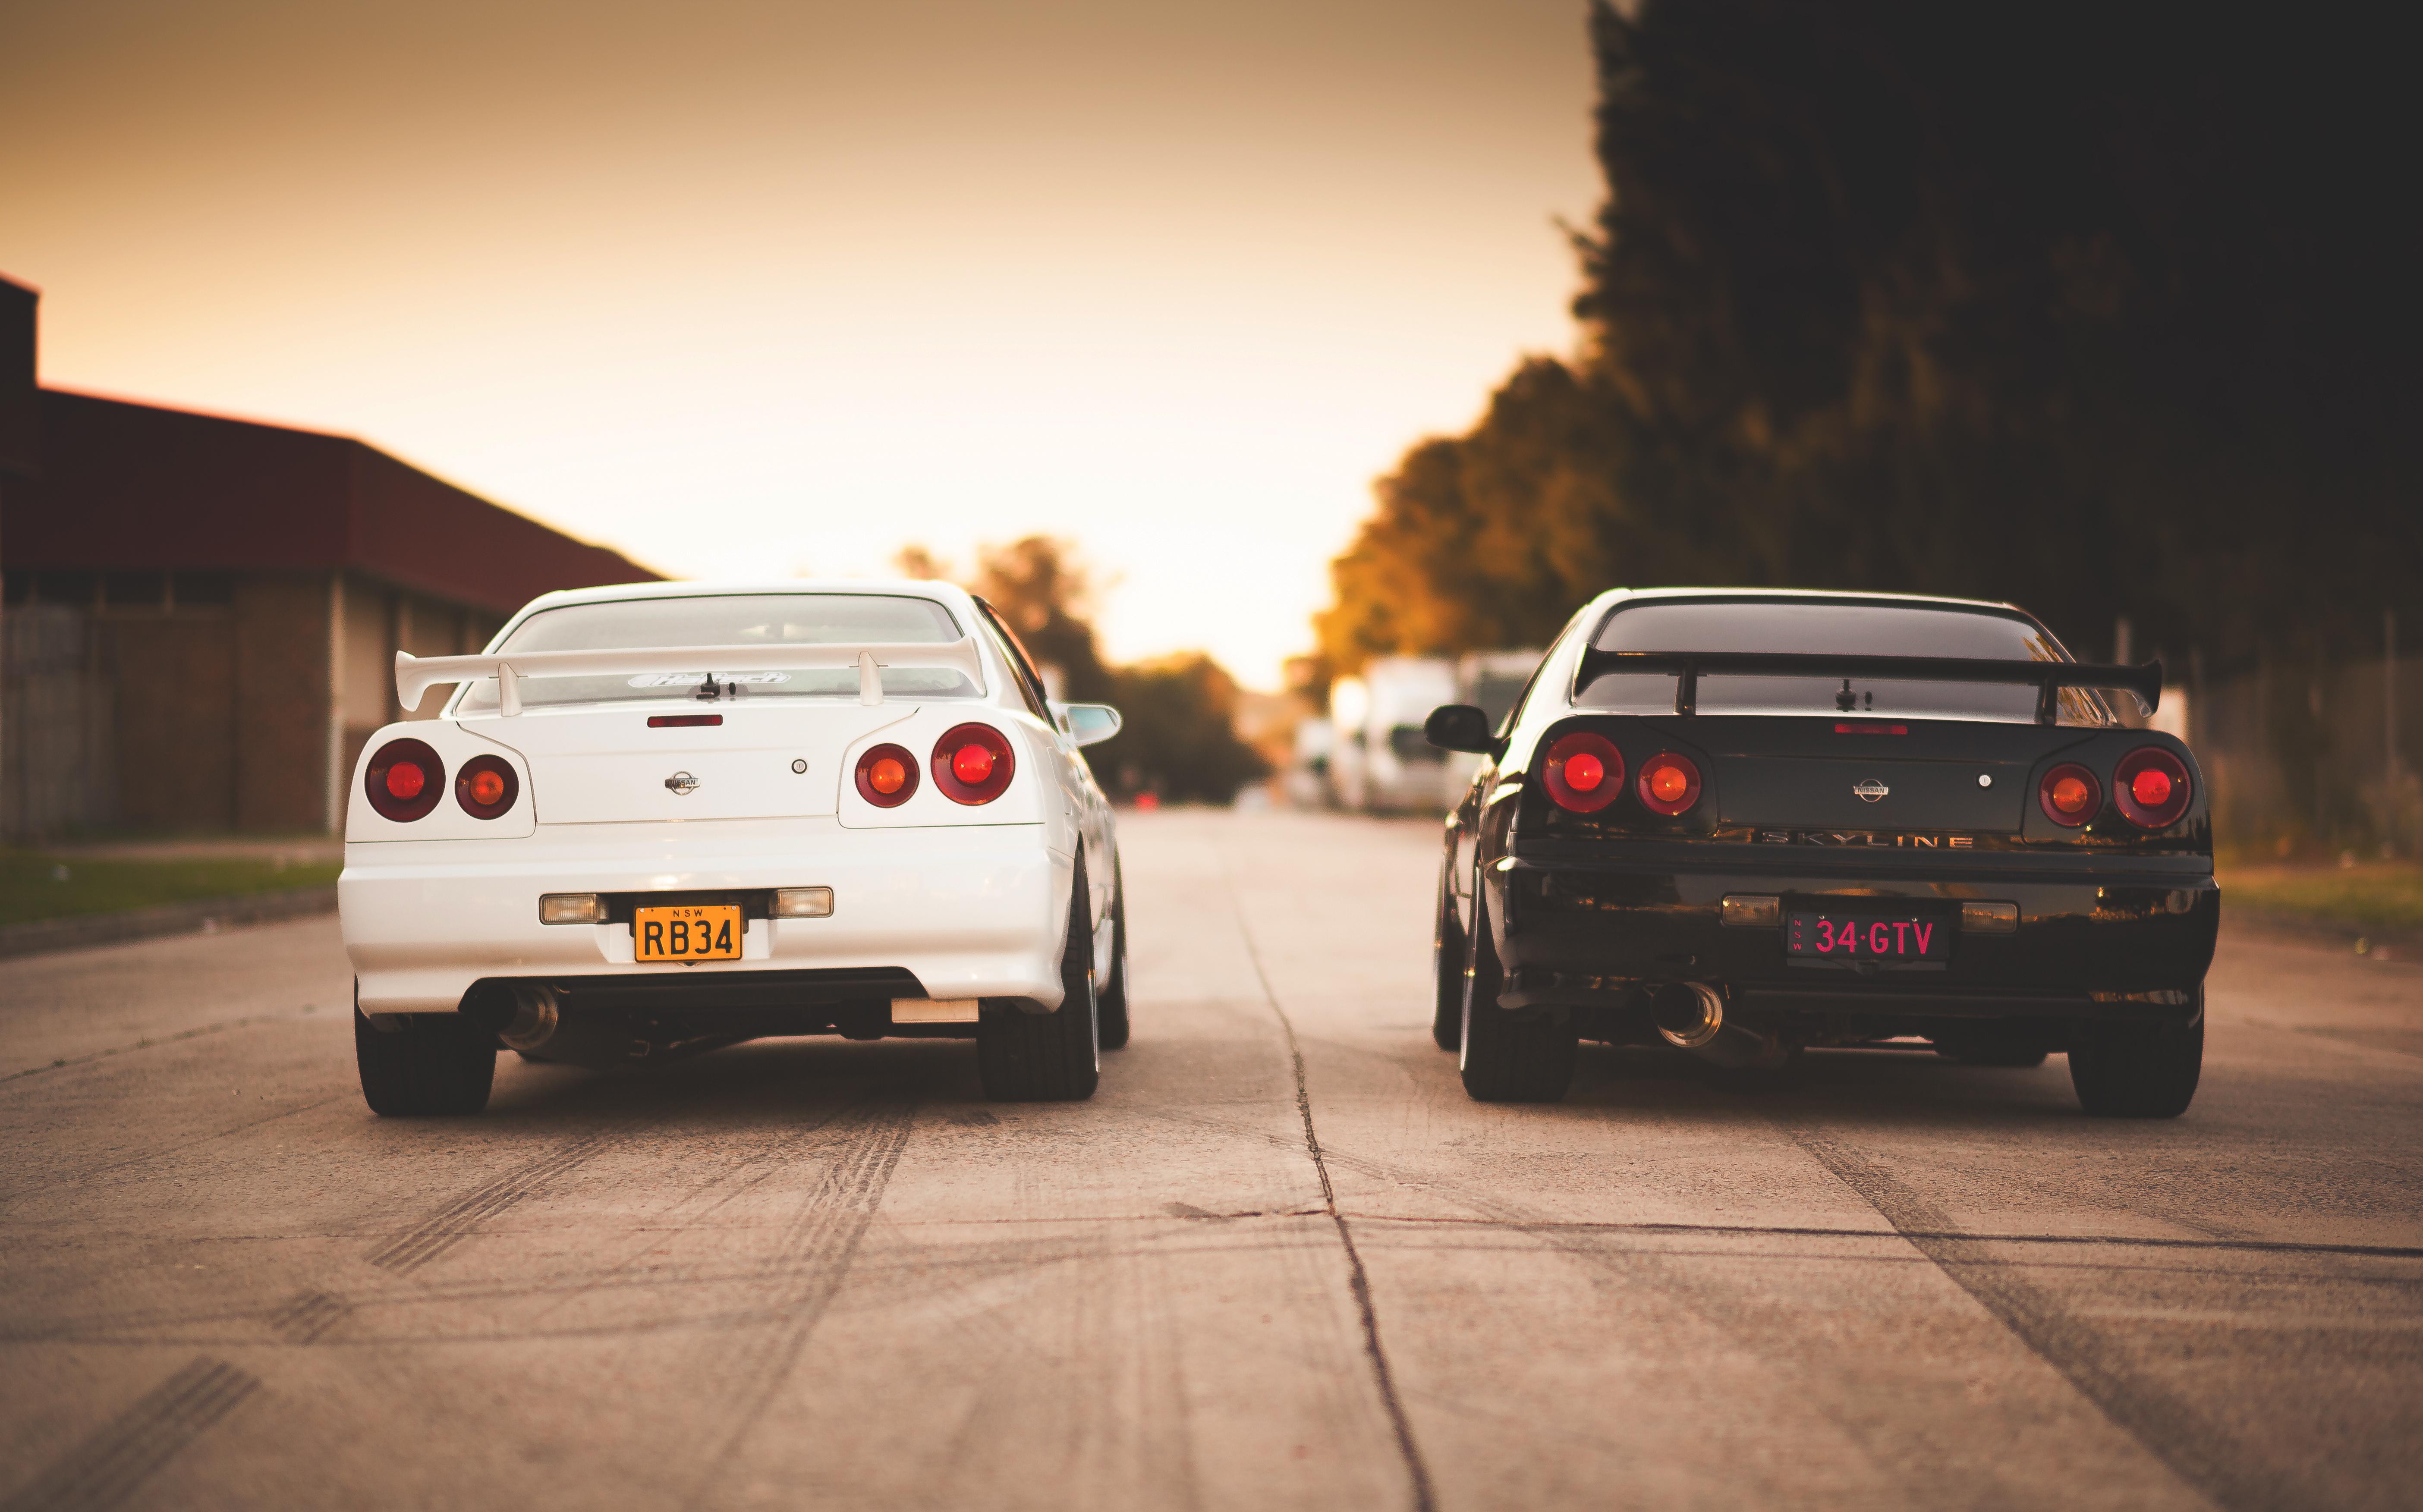 Free Download 65 Nissan Skyline Hd Wallpapers Hintergrnde